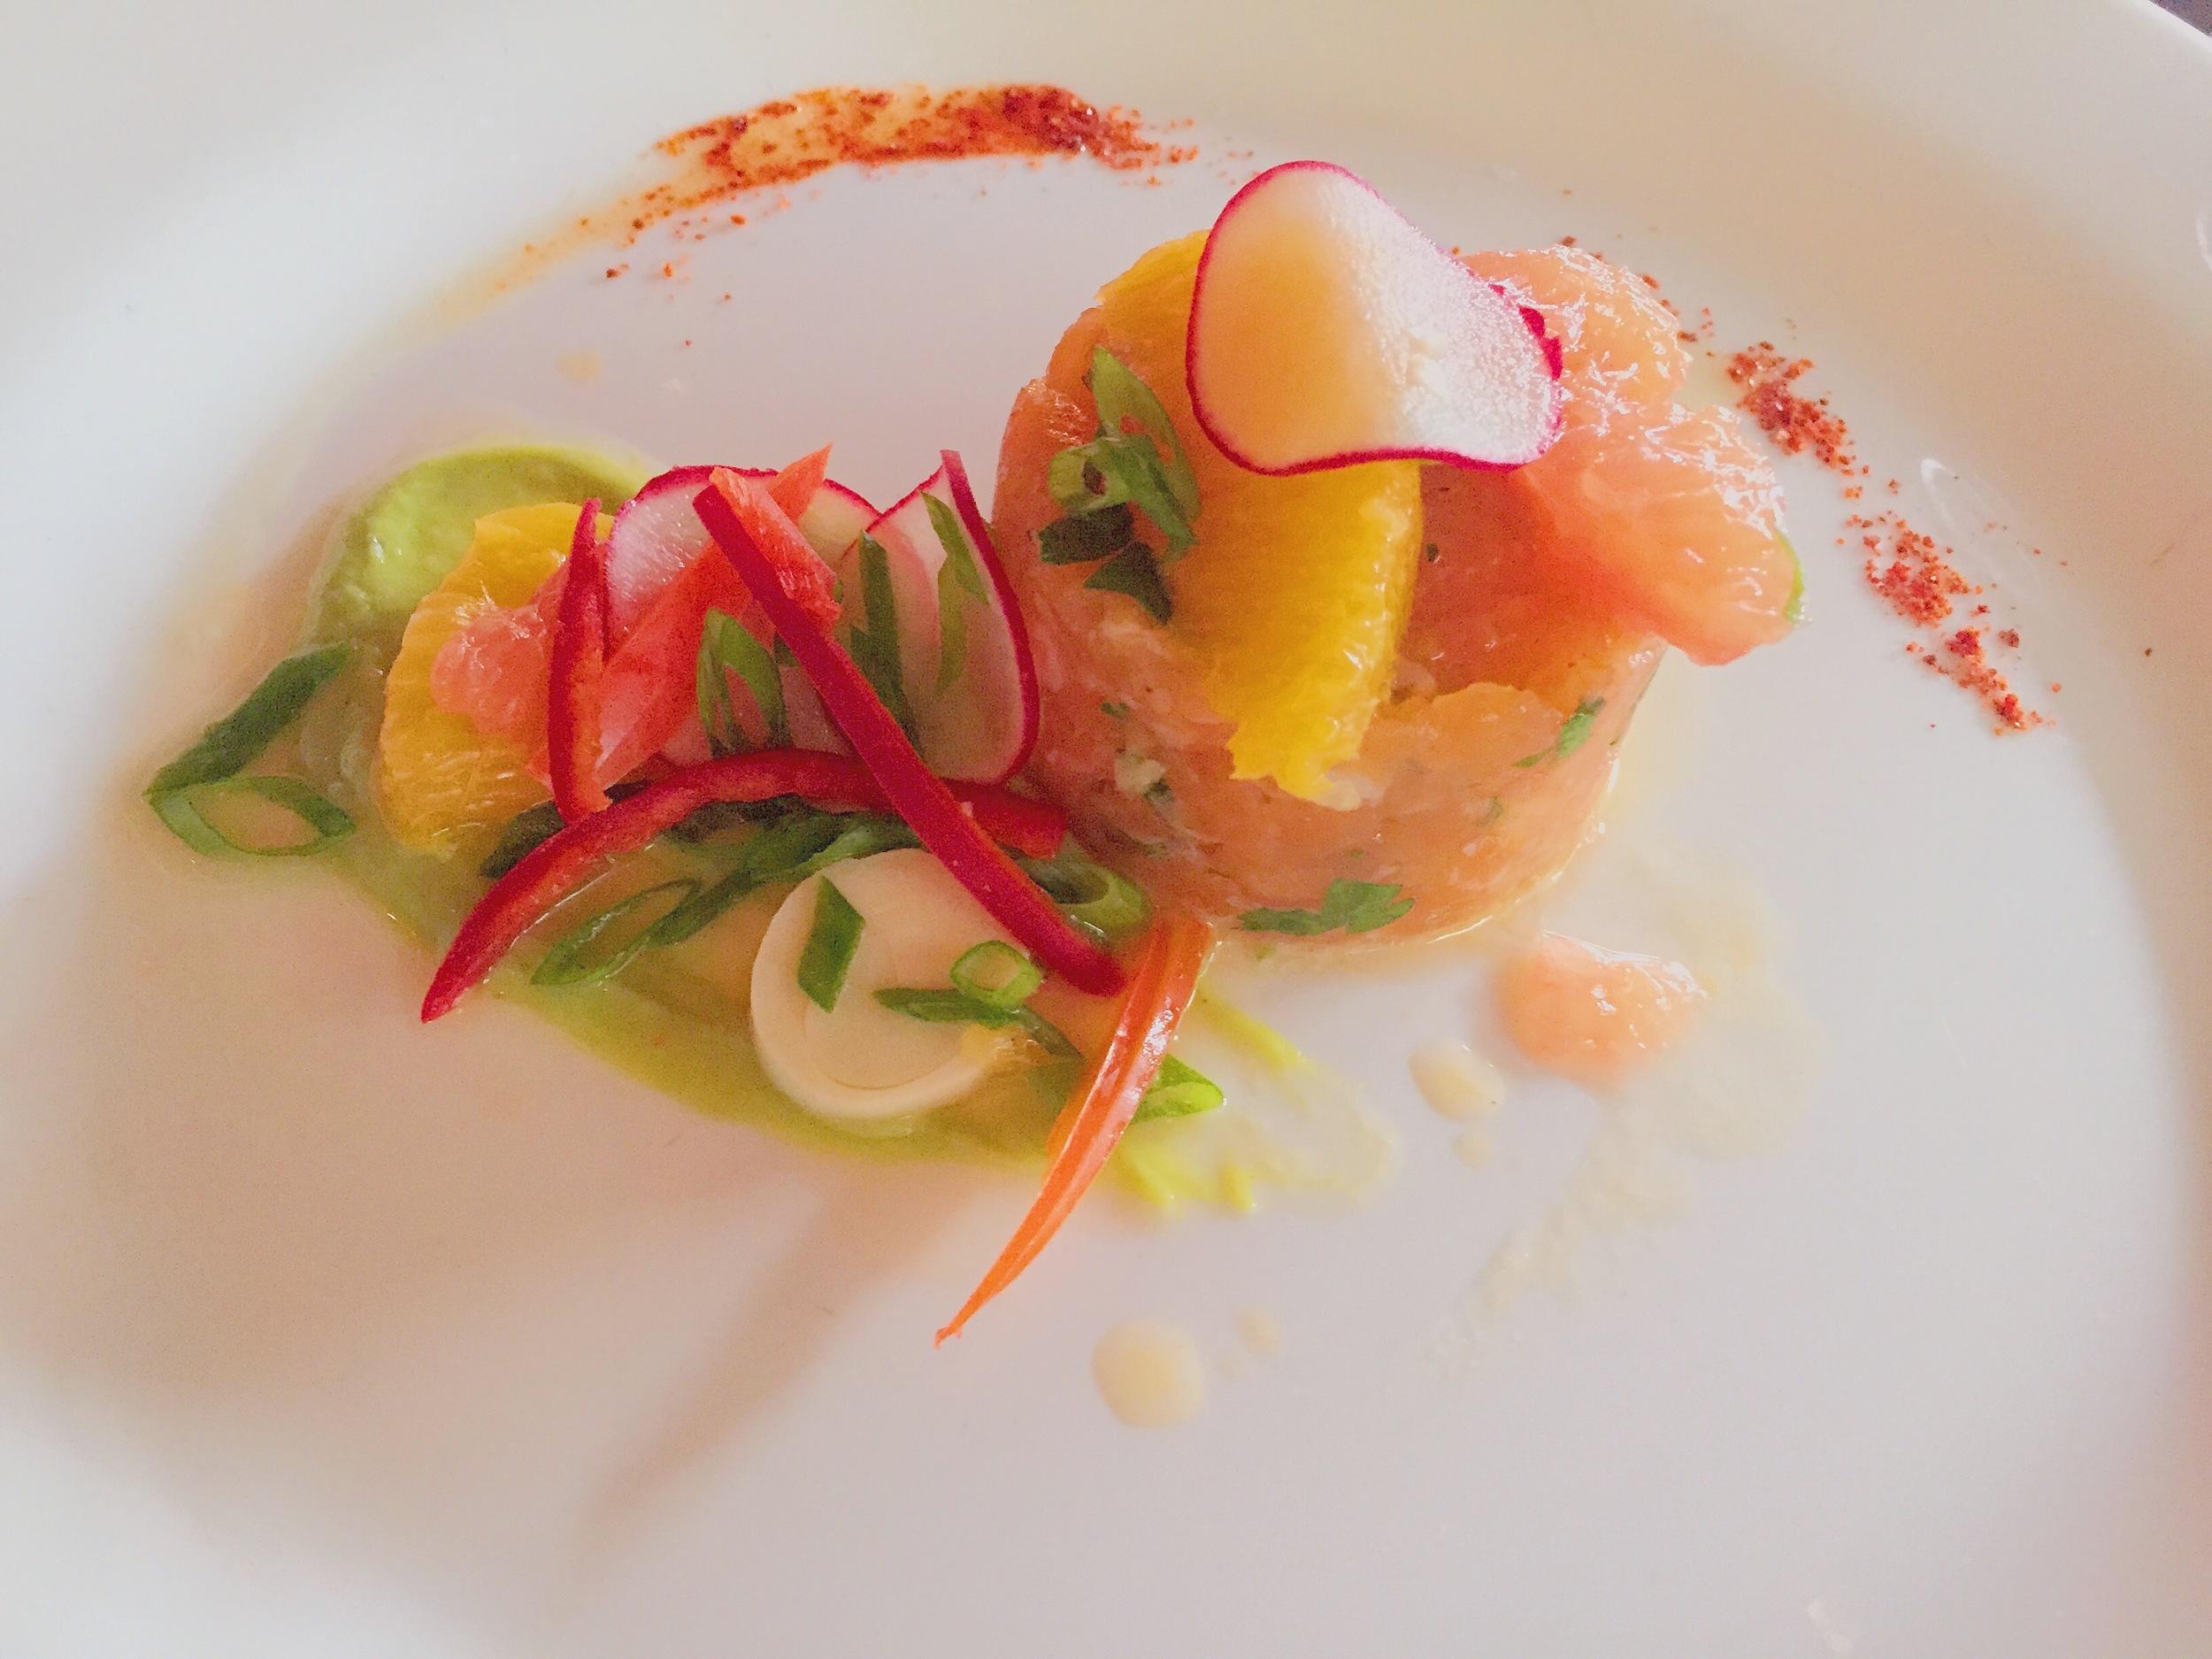 Salmon Tartare: california olive oil, citrus, hearts of palm, whipped avocado